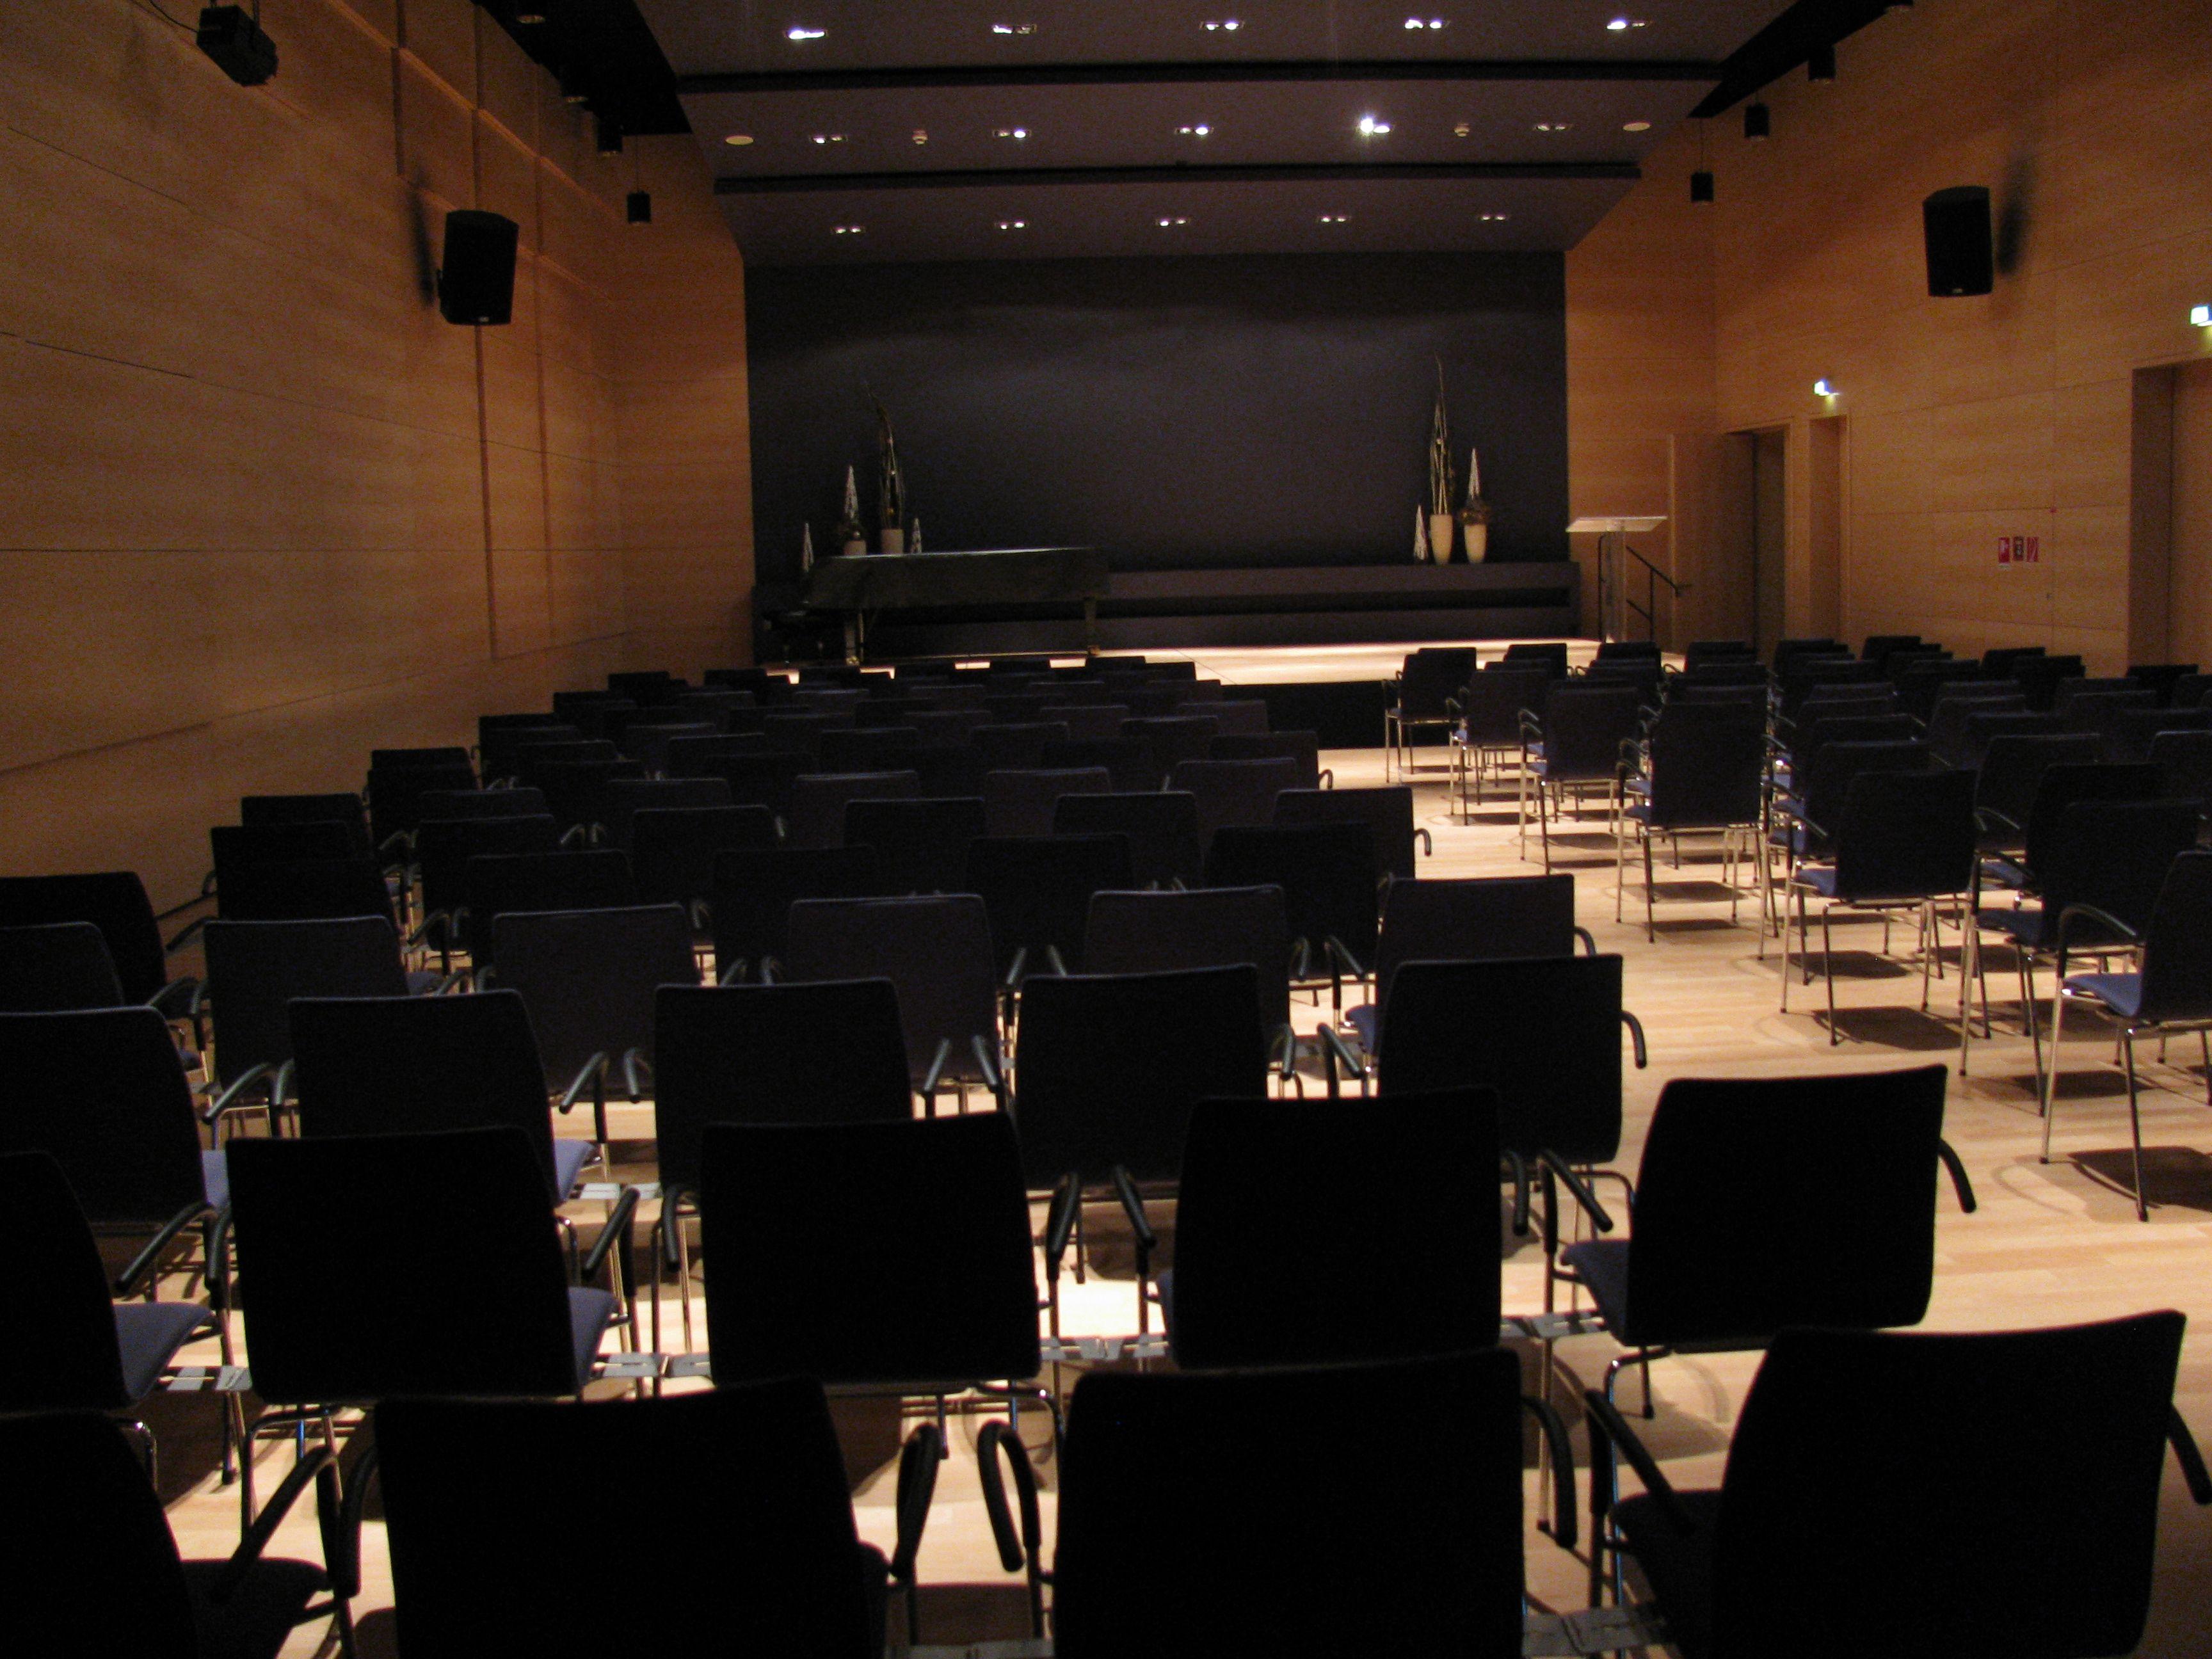 Hermann-Levi-Saal - Konzertsaal im Rathaus